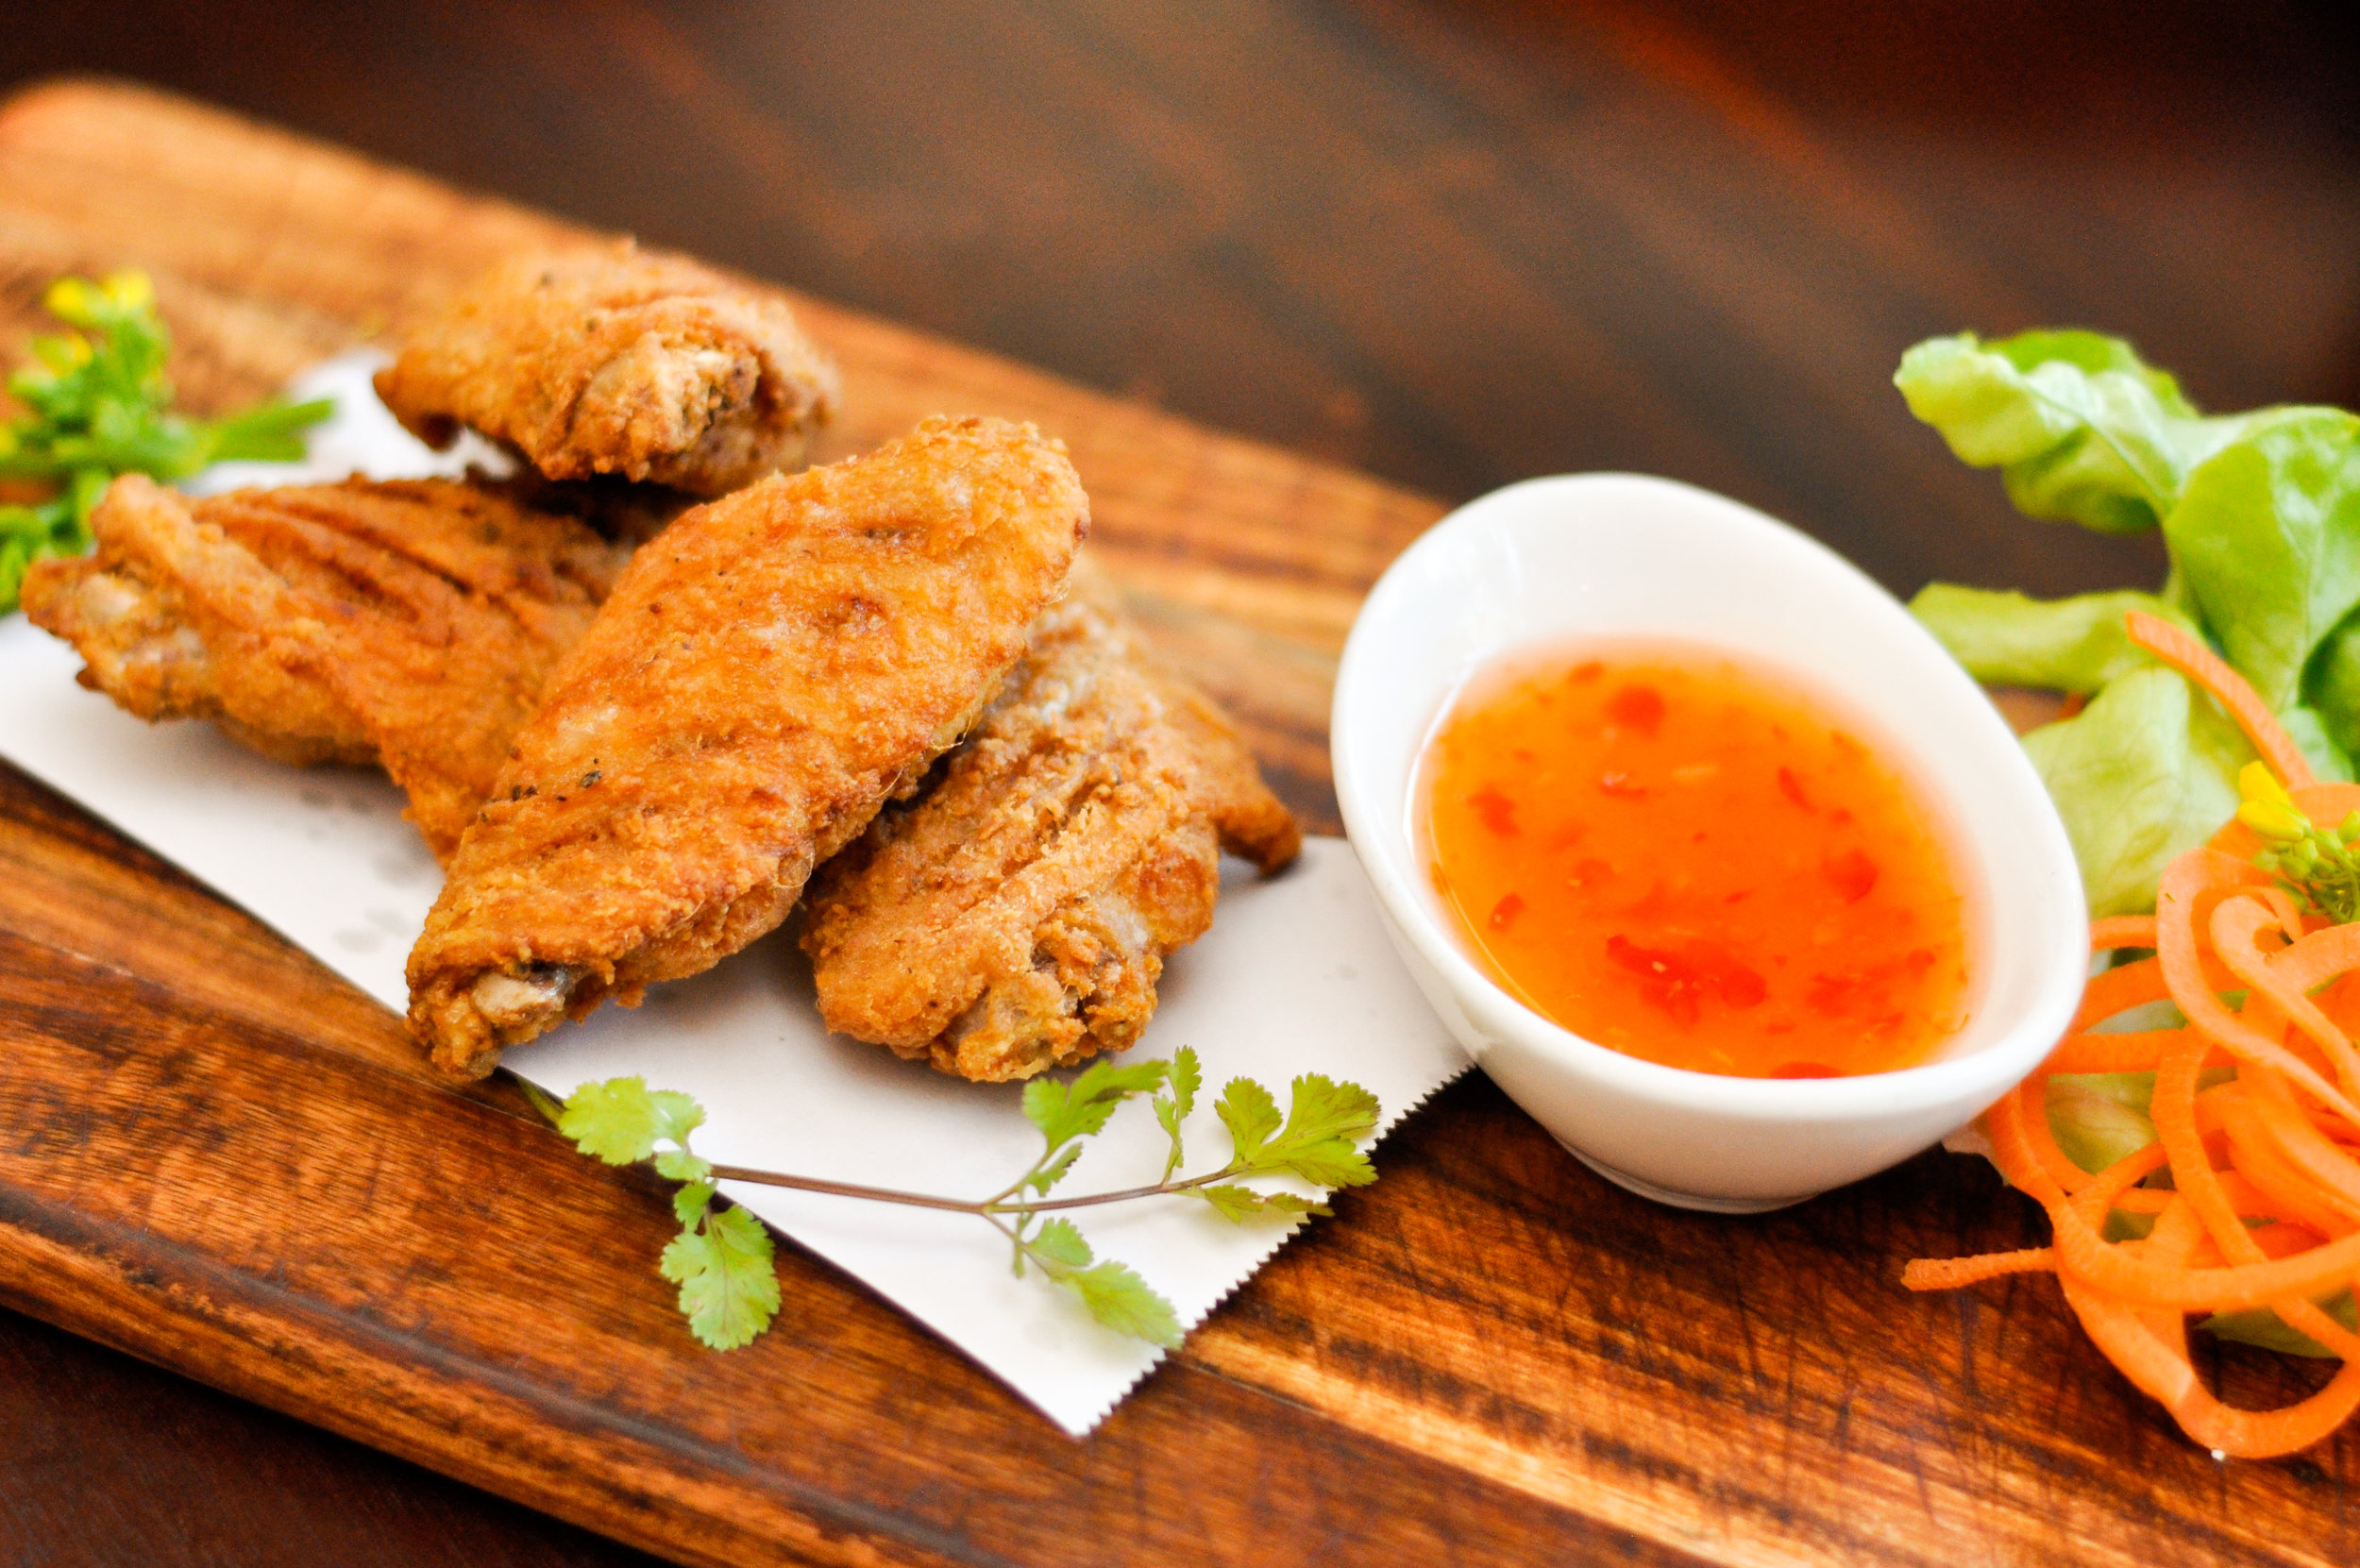 Mid Wing Chicken (GF)